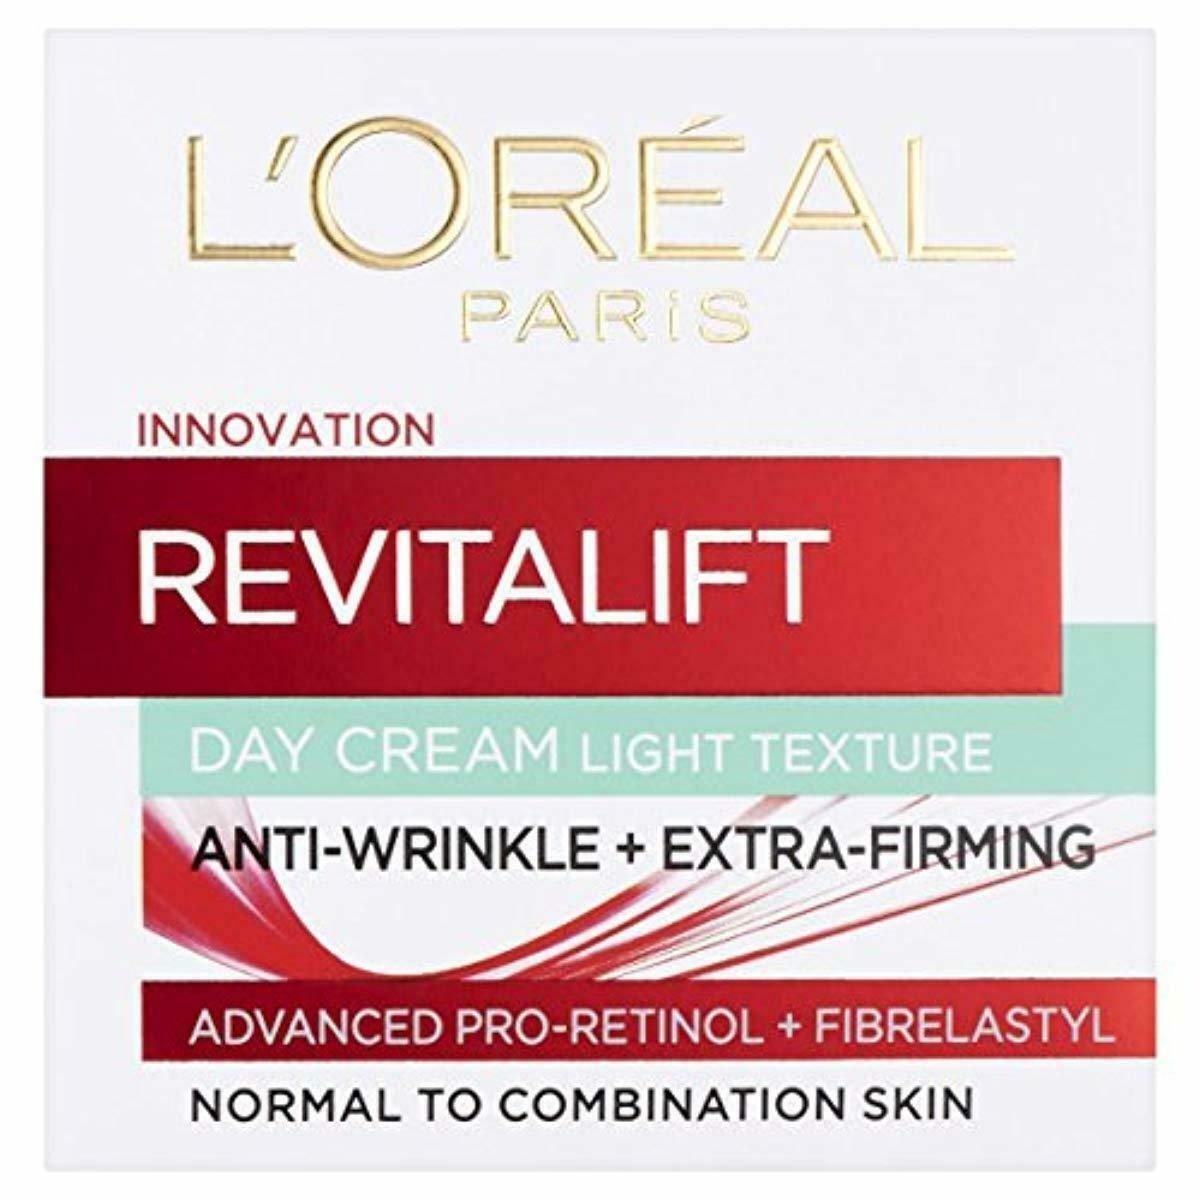 L'oreal Paris Revitalift Classic Light Day Cream Αντιρυτιδική Κρέμα με Ελαφρία Υφή 50ml